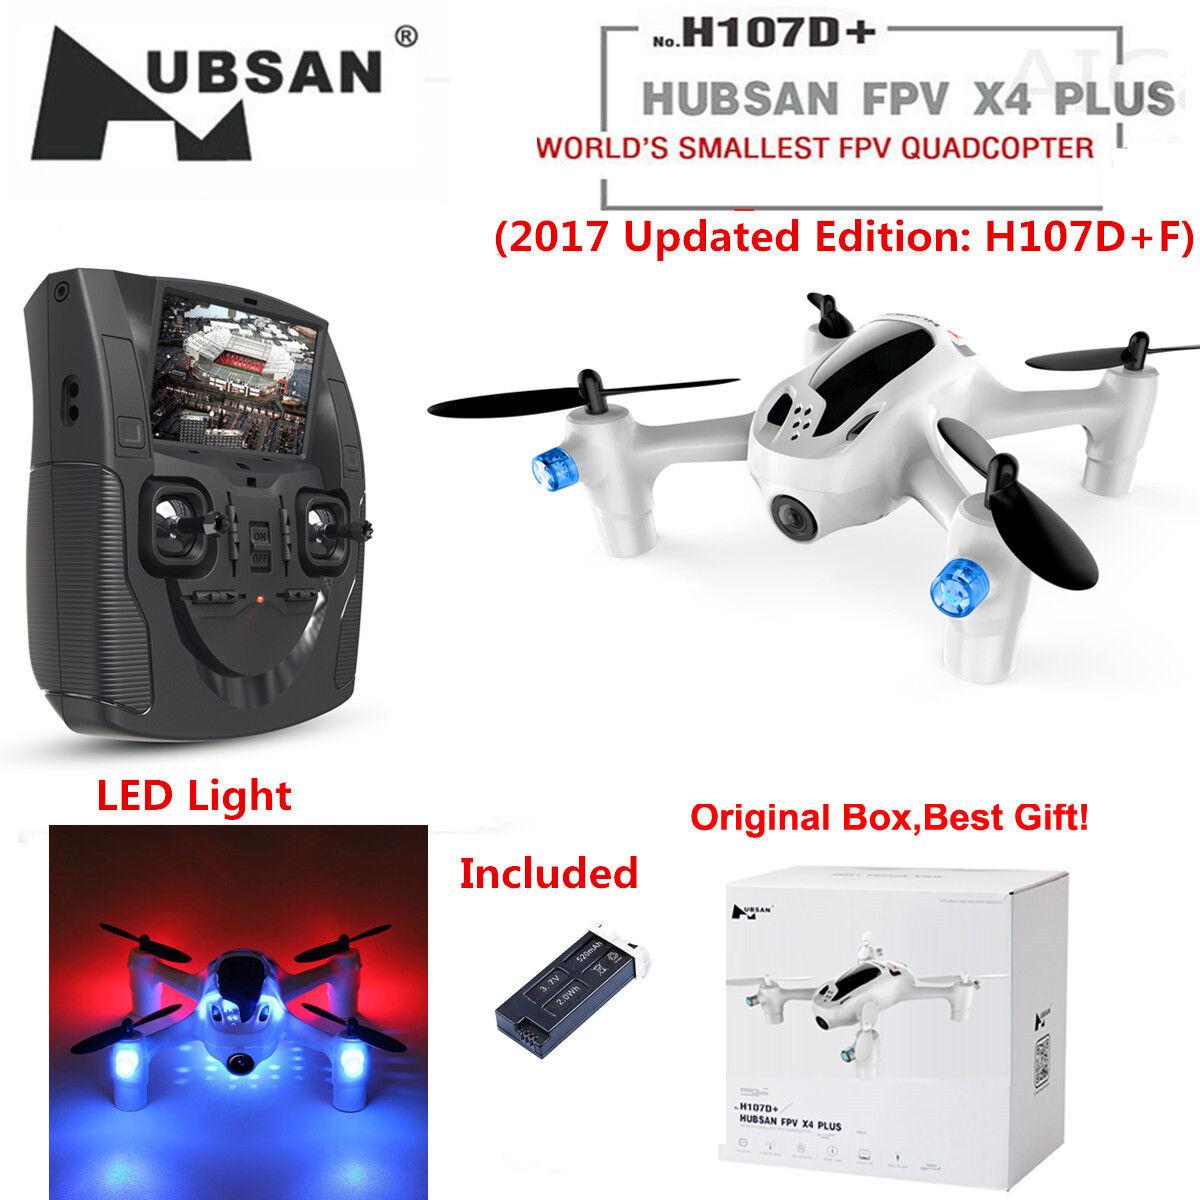 Hubsan H107D+ X4 FPV Plus 2.4G 2.4G 2.4G Mini Headless RC Quadcopter 720P HD Altitude RTF eb6bbf